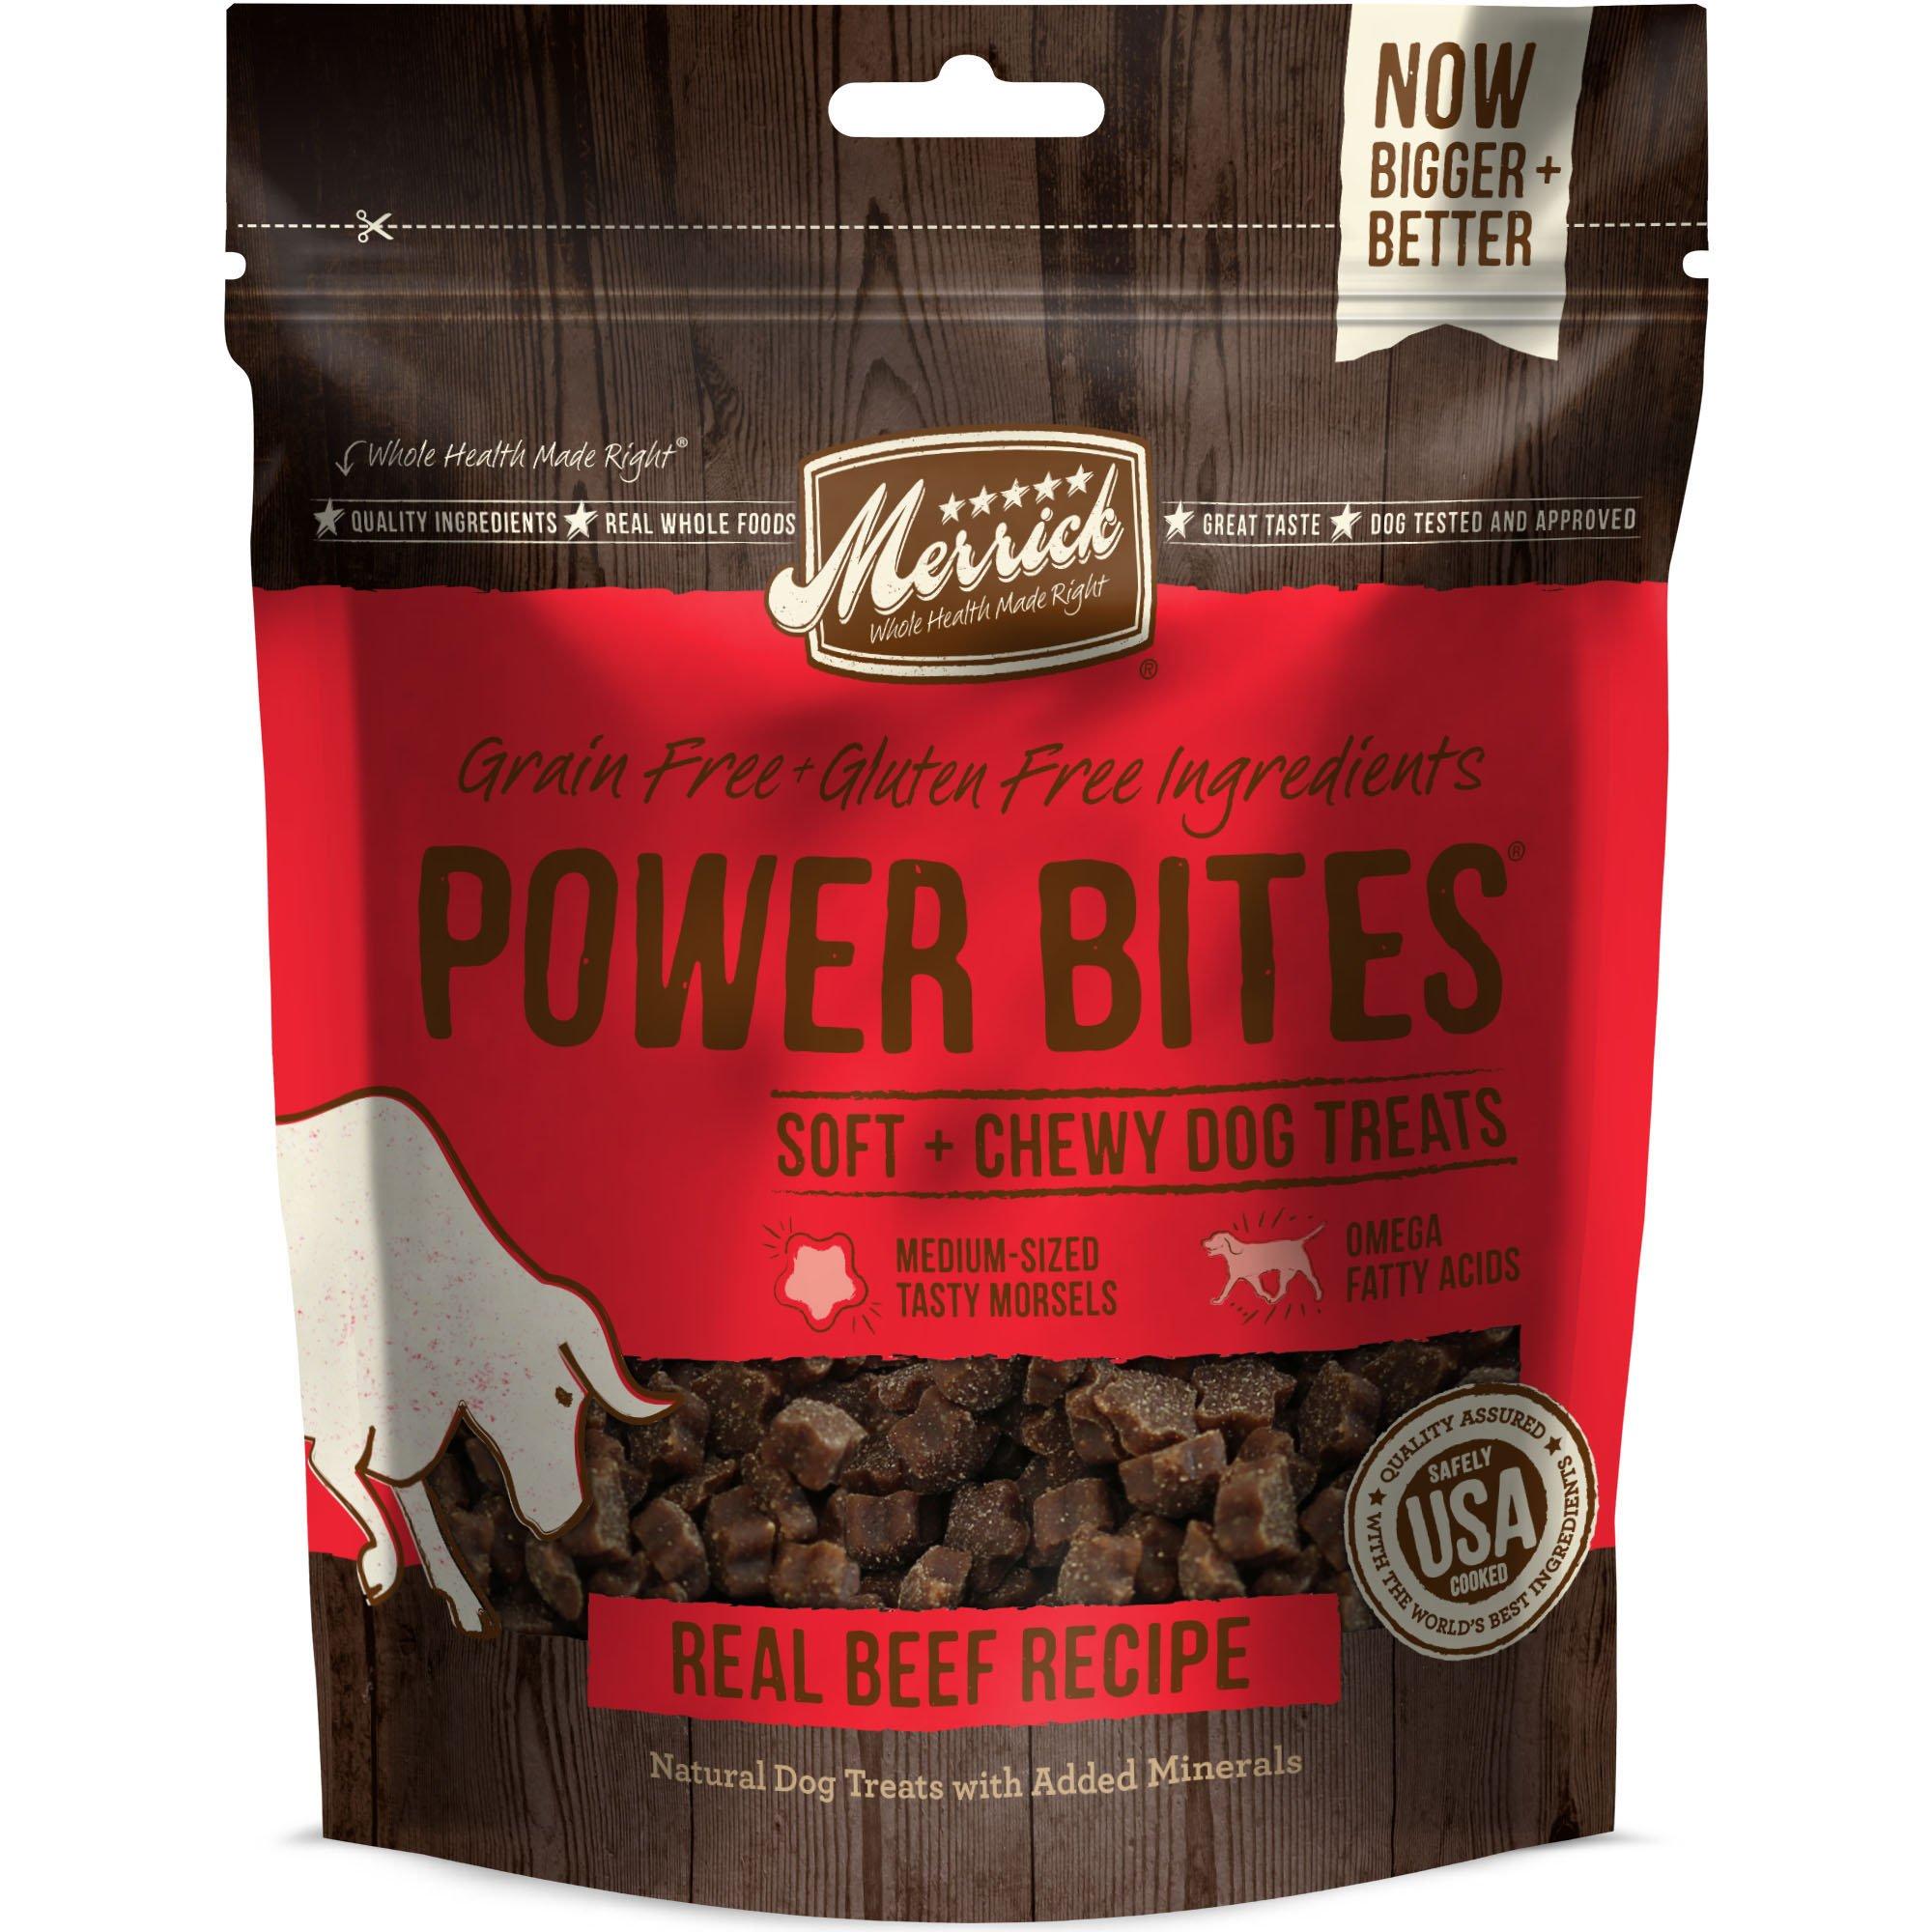 Merrick Power Bites Soft & Chewy Beef Dog Treats